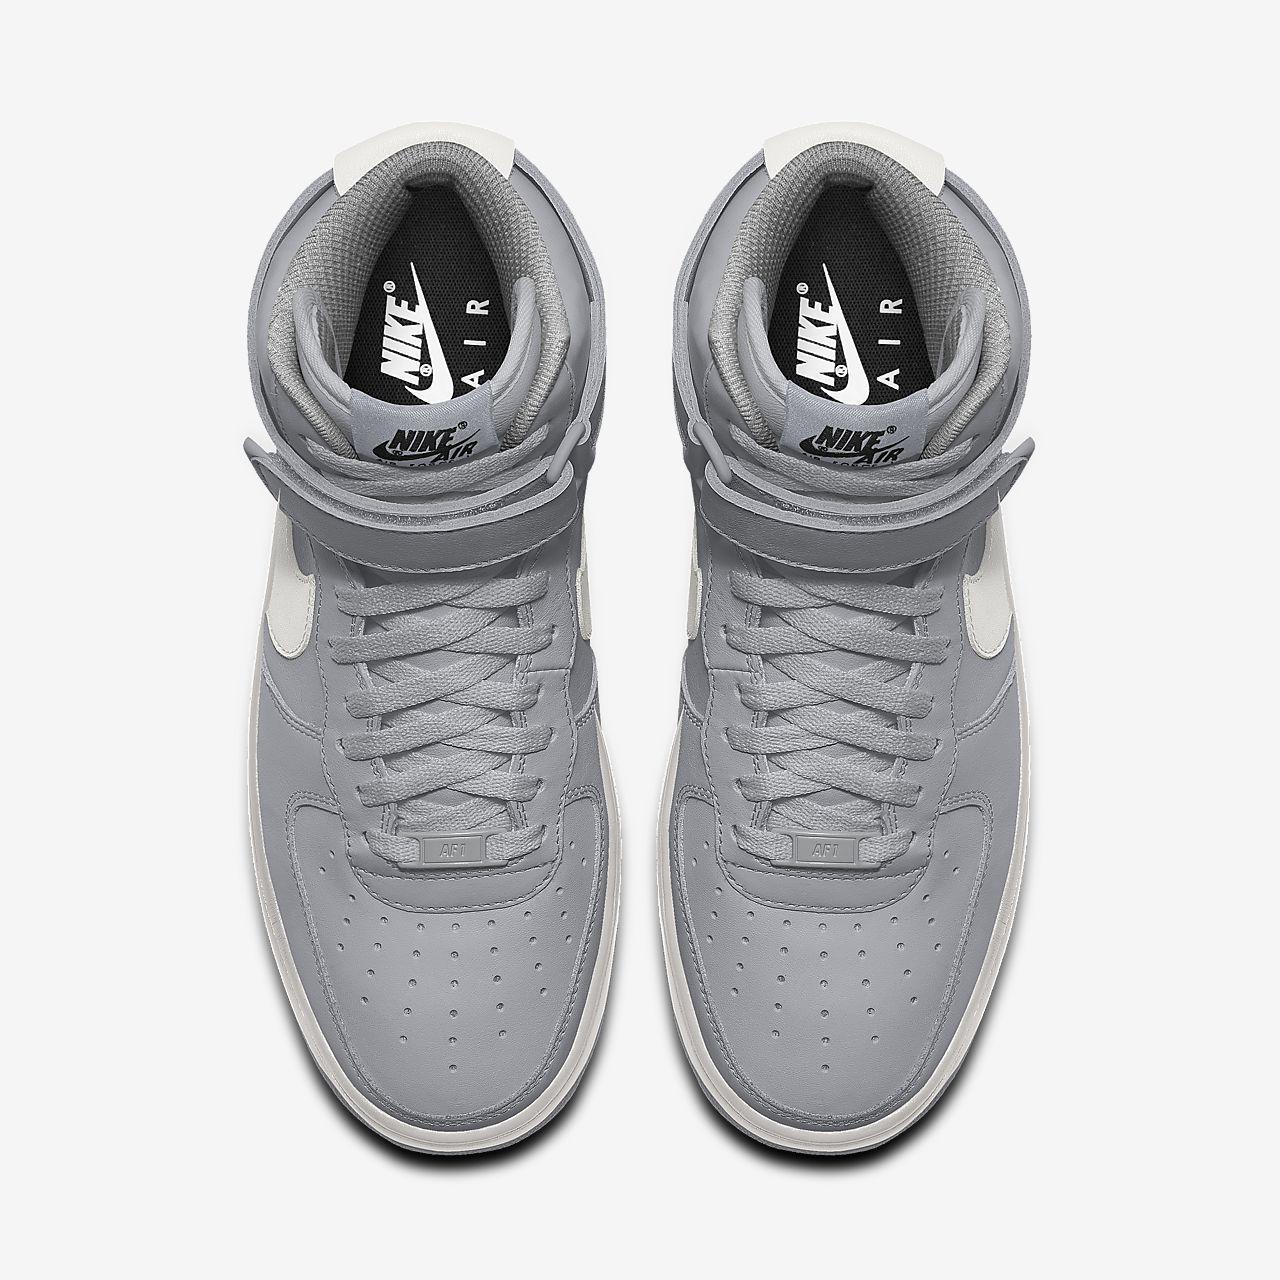 Calzado para mujer personalizado Nike Air Force 1 High By You